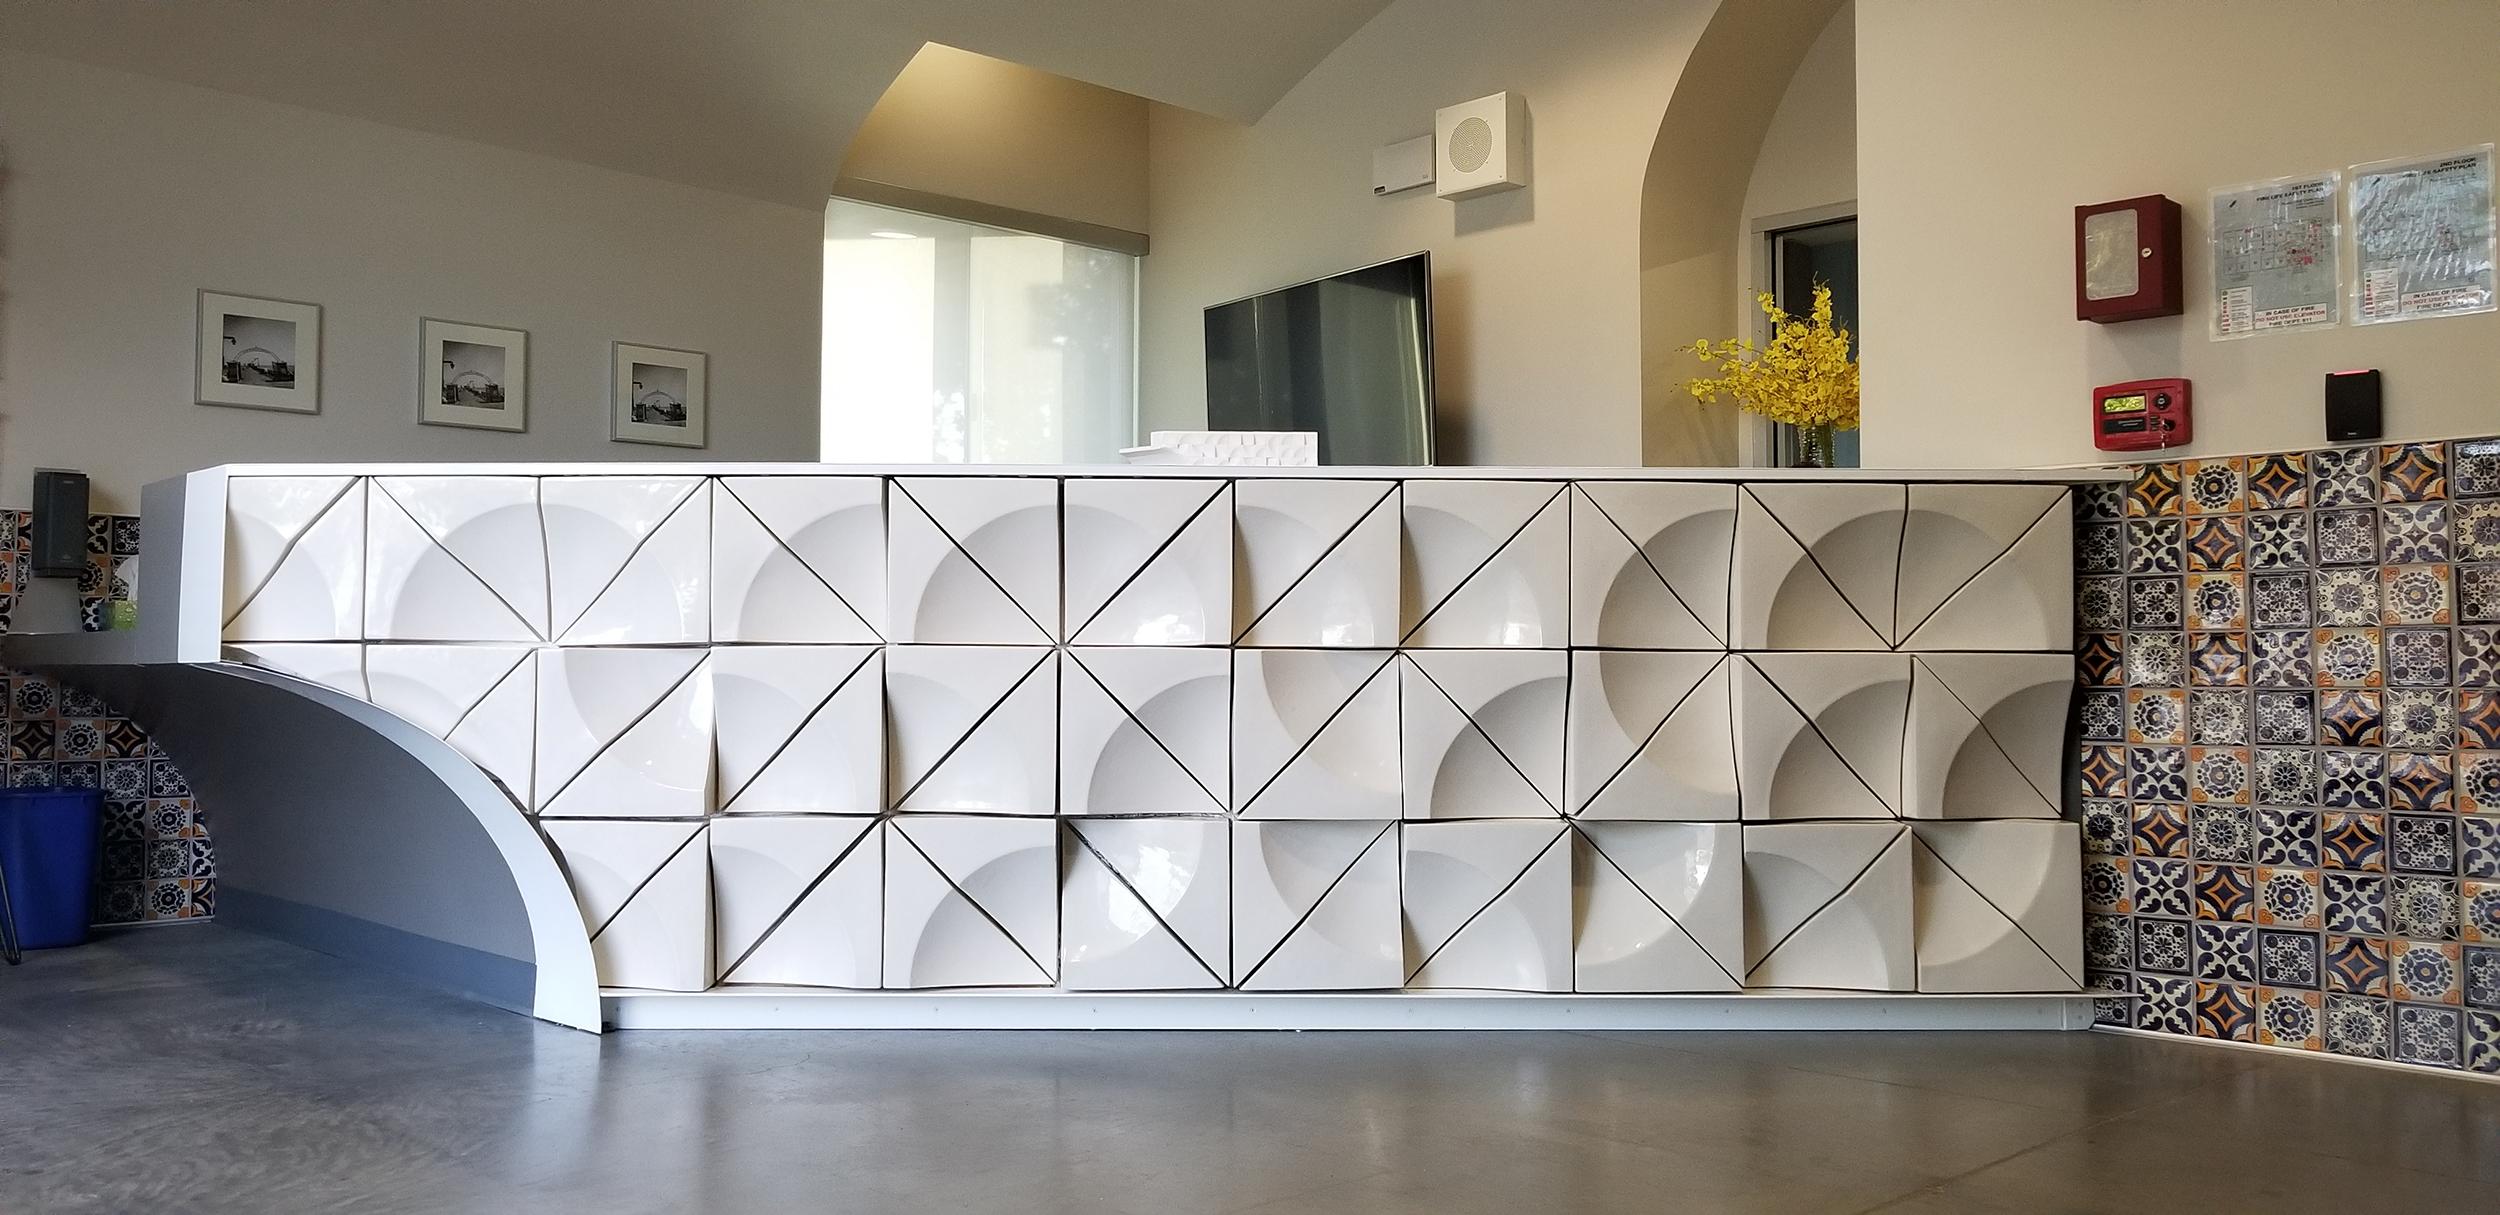 SLO Made reception desk